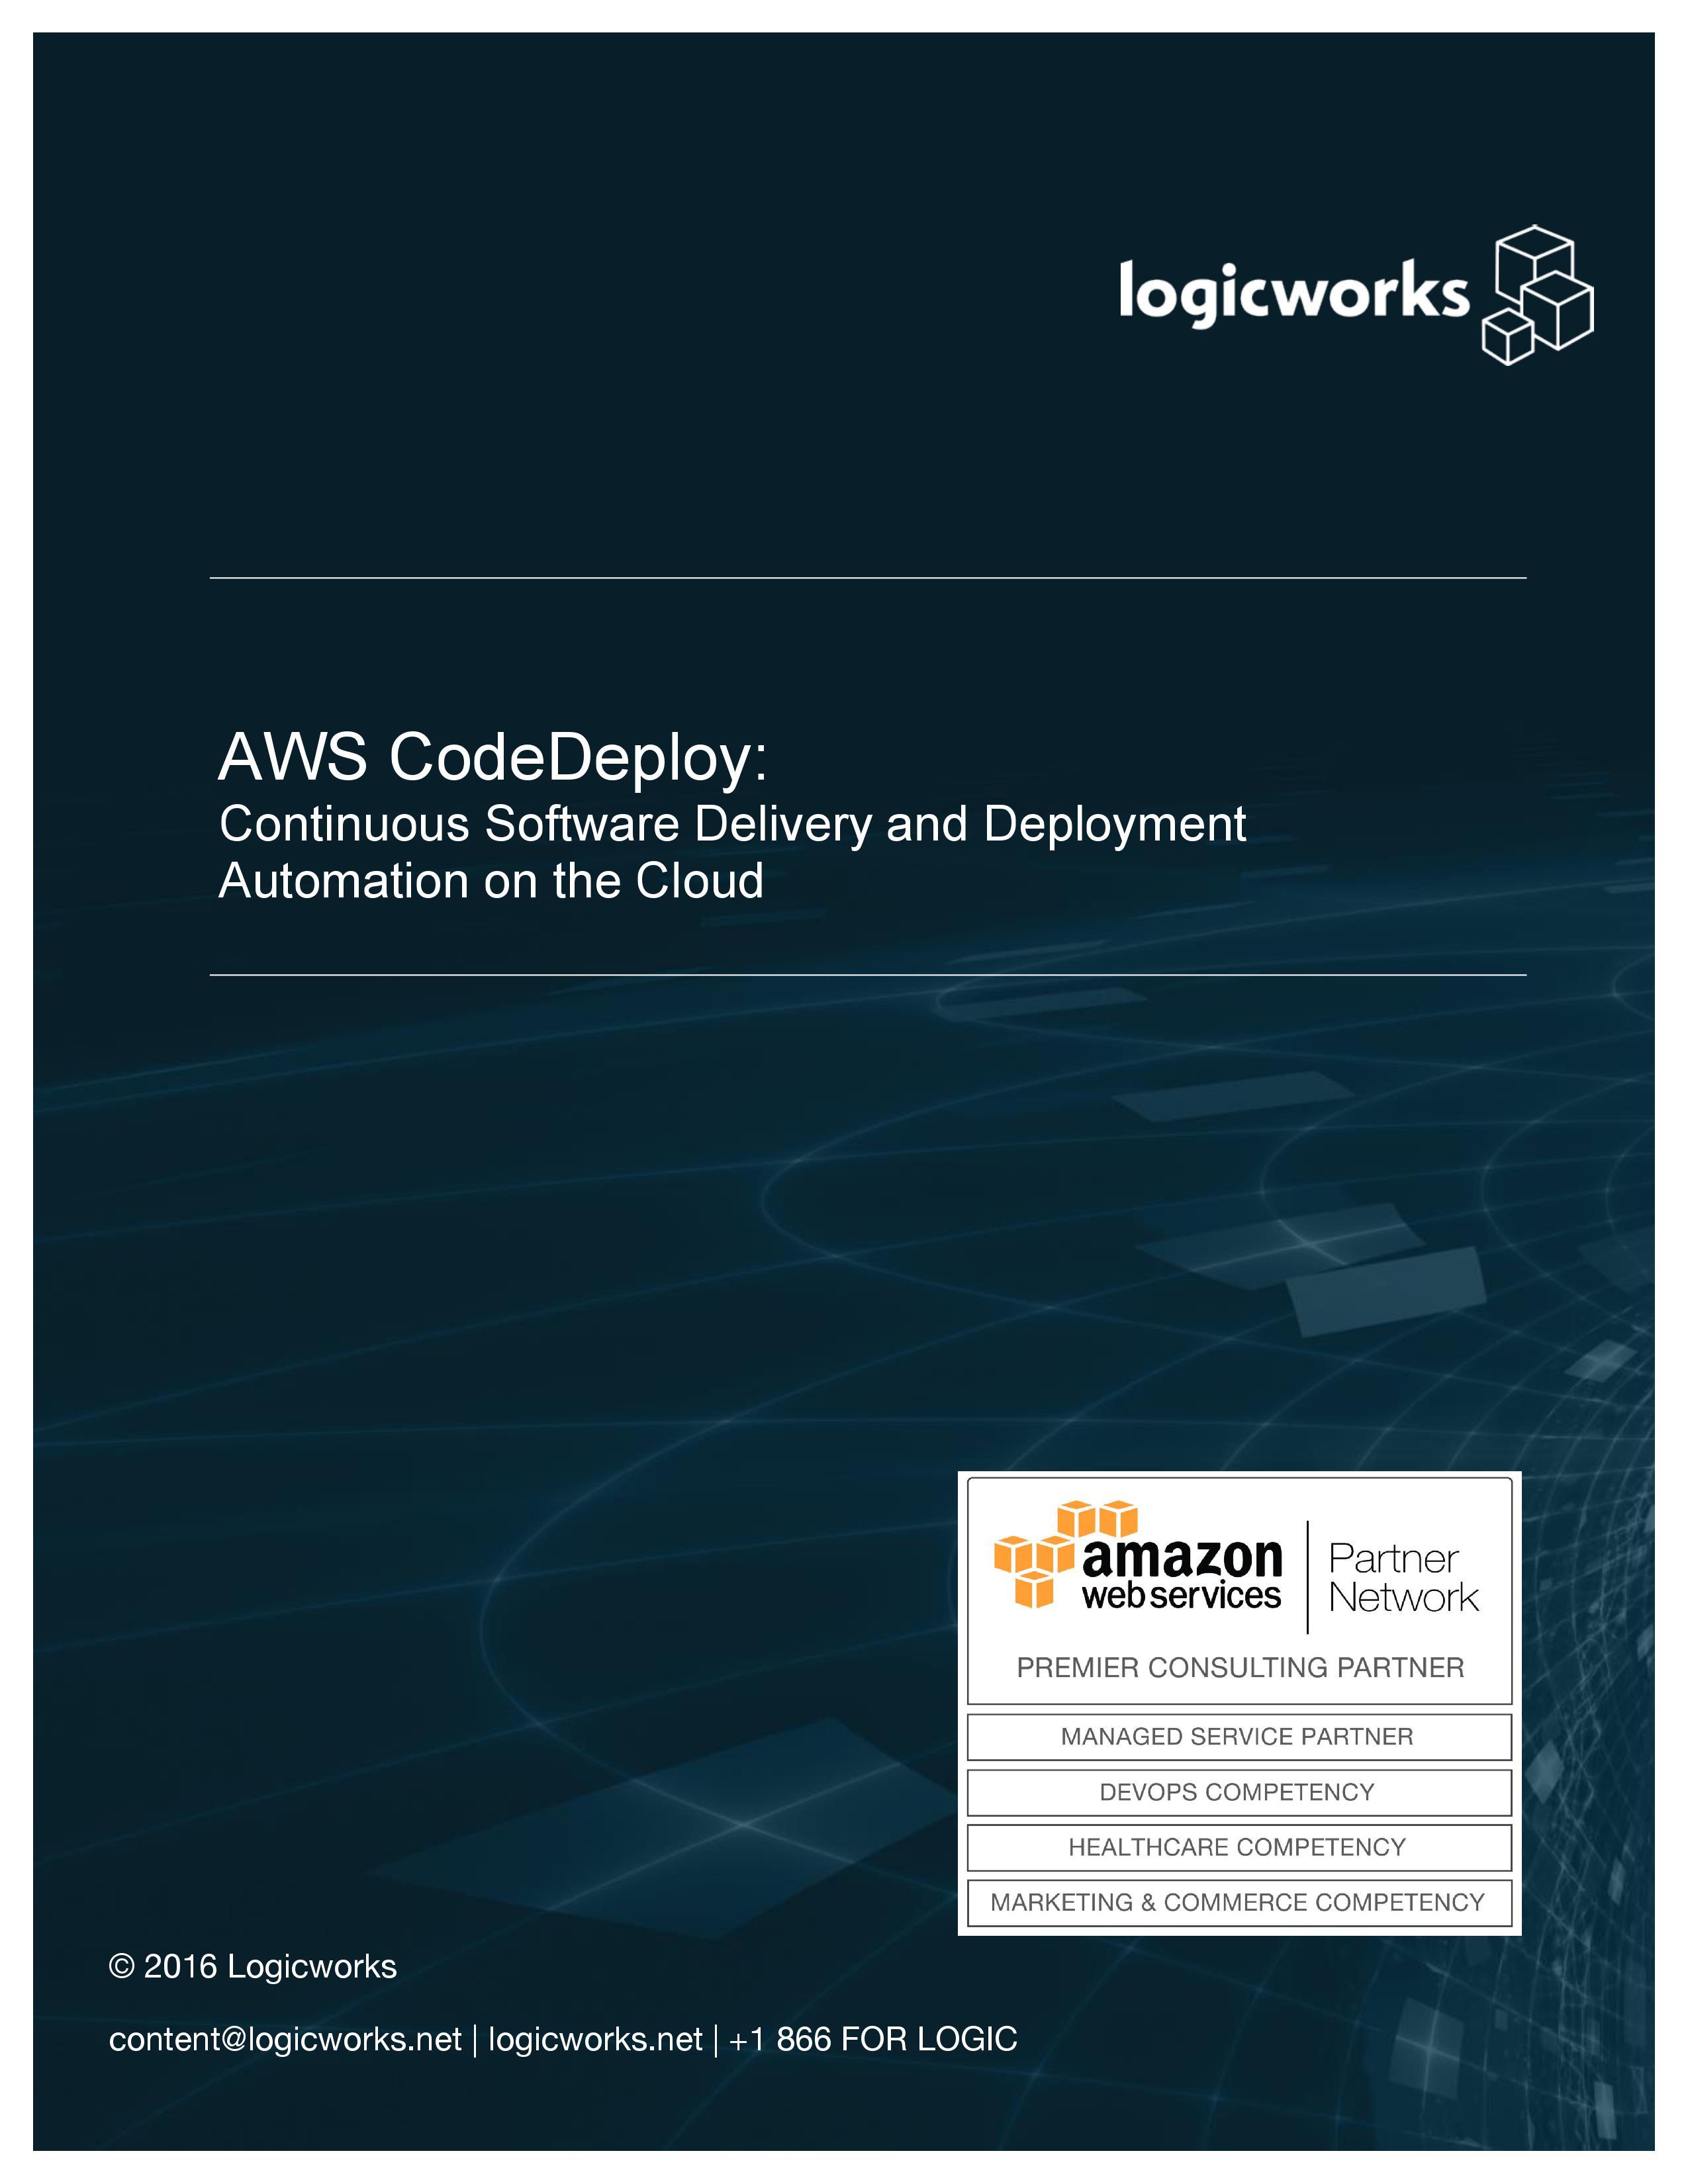 AWS CodeDeploy.jpg